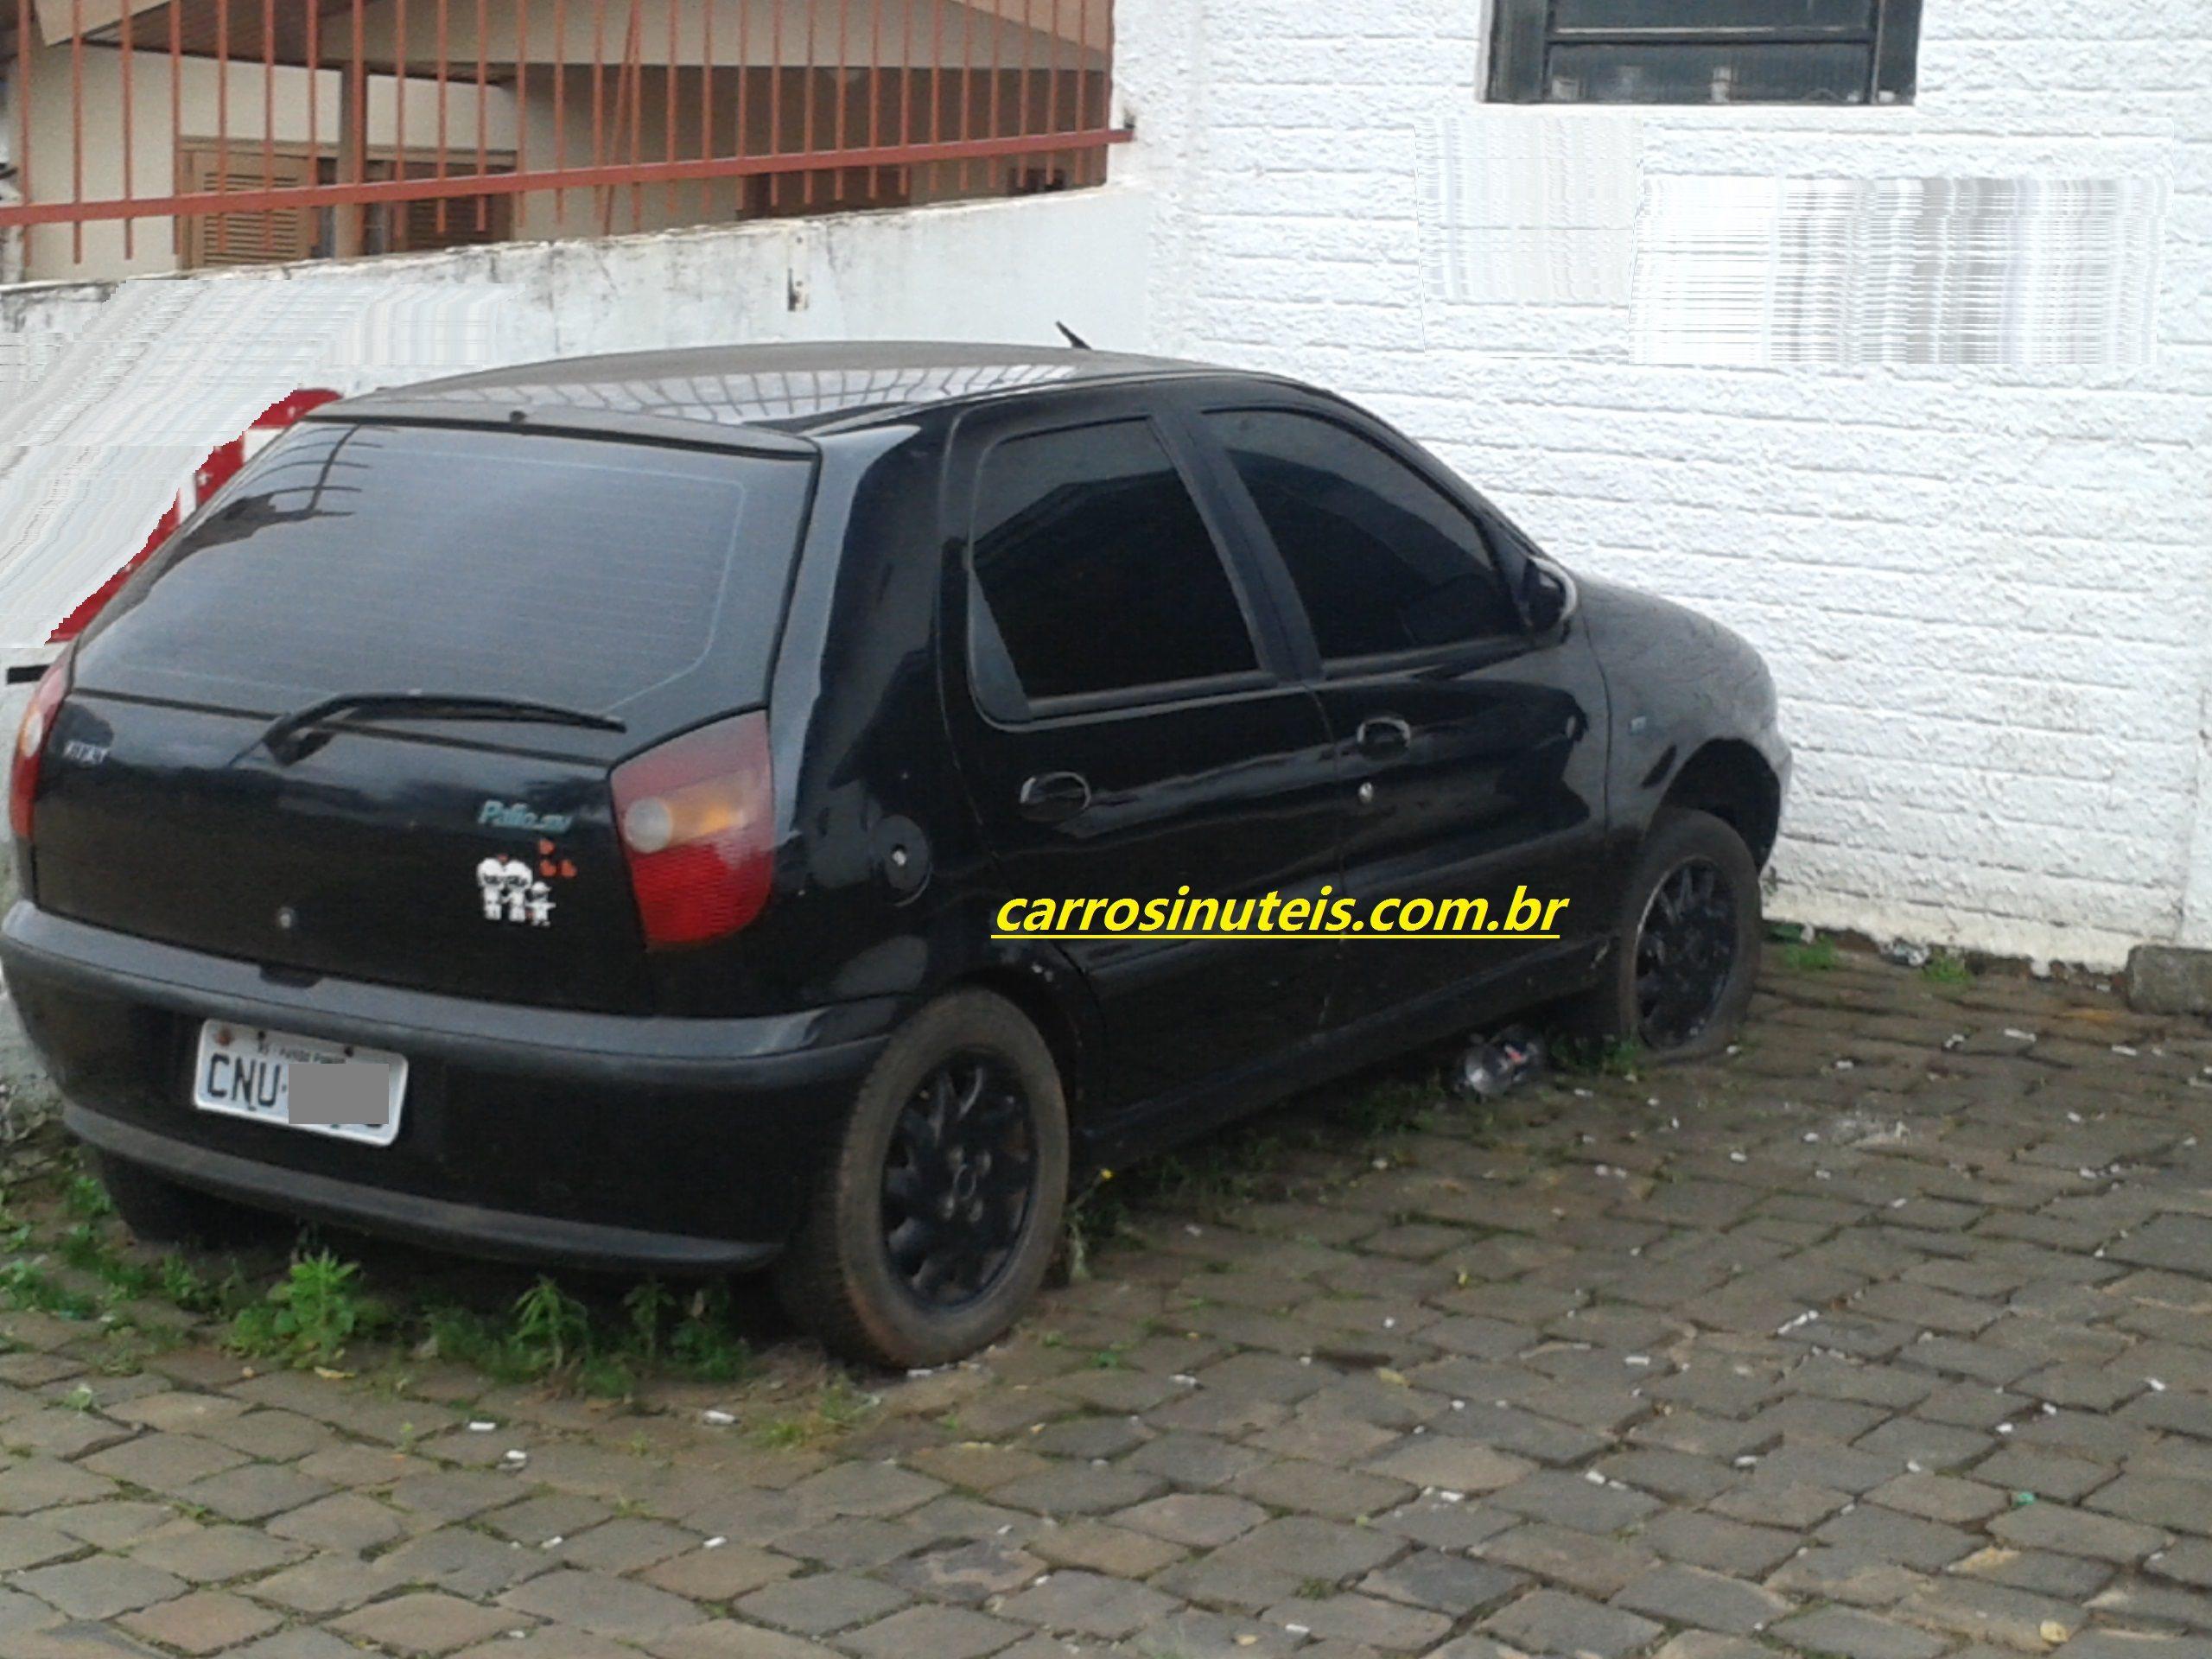 felipe-palio-passo-fundo Fiat Palio, by Felipe, Passo Fundo-RS